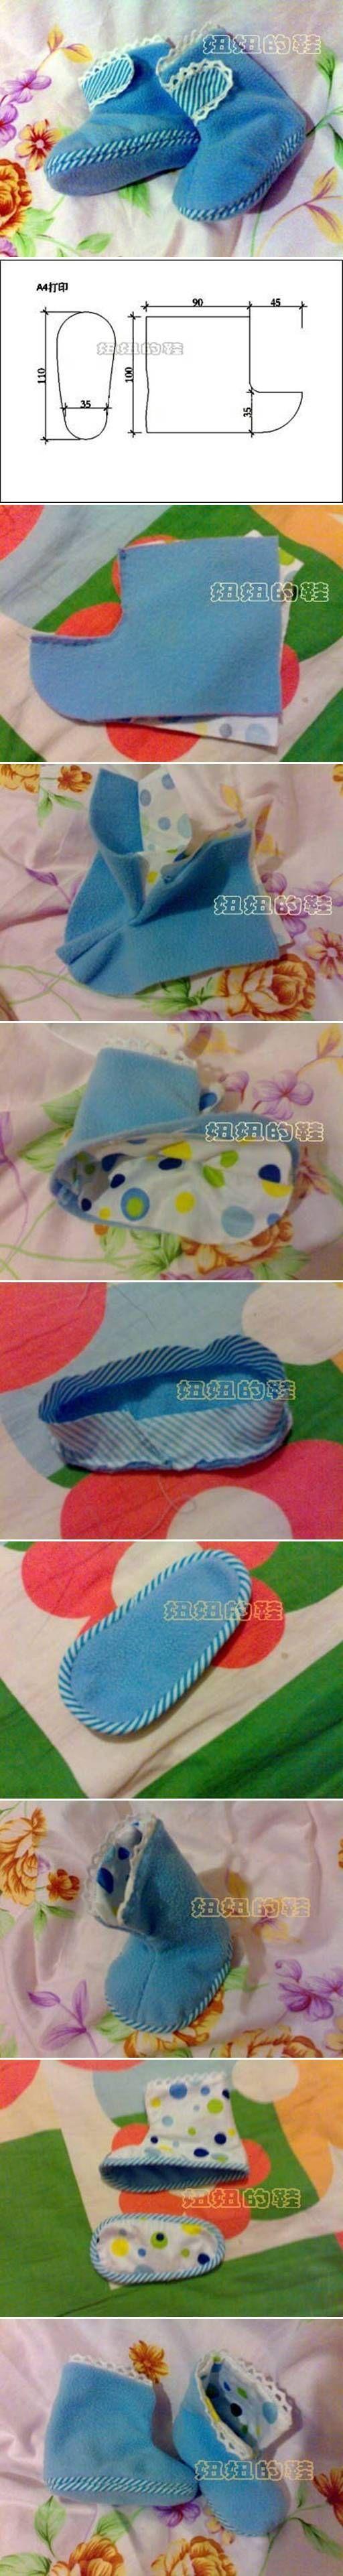 DIY Baby Boot DIY Projects | UsefulDIY.com Follow Us on Facebook ==> http://www.facebook.com/UsefulDiy